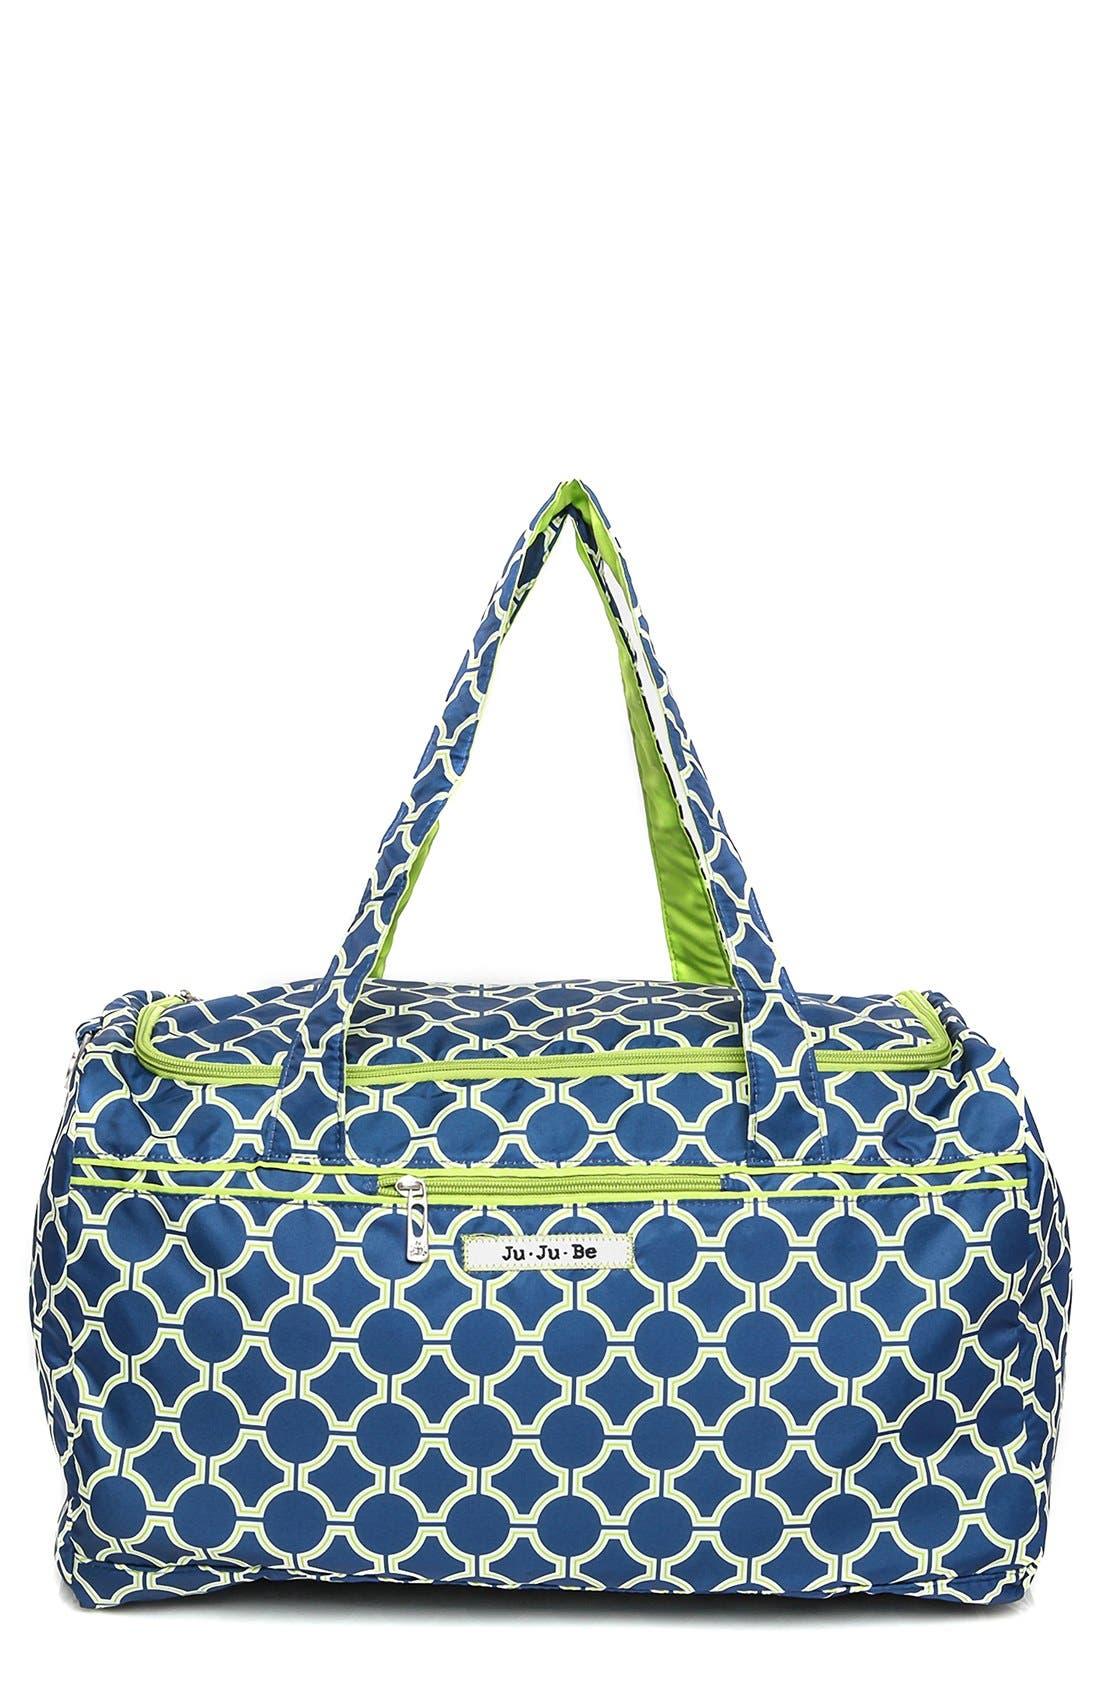 'Super Star' Travel Diaper Bag,                             Main thumbnail 1, color,                             Royal Envy